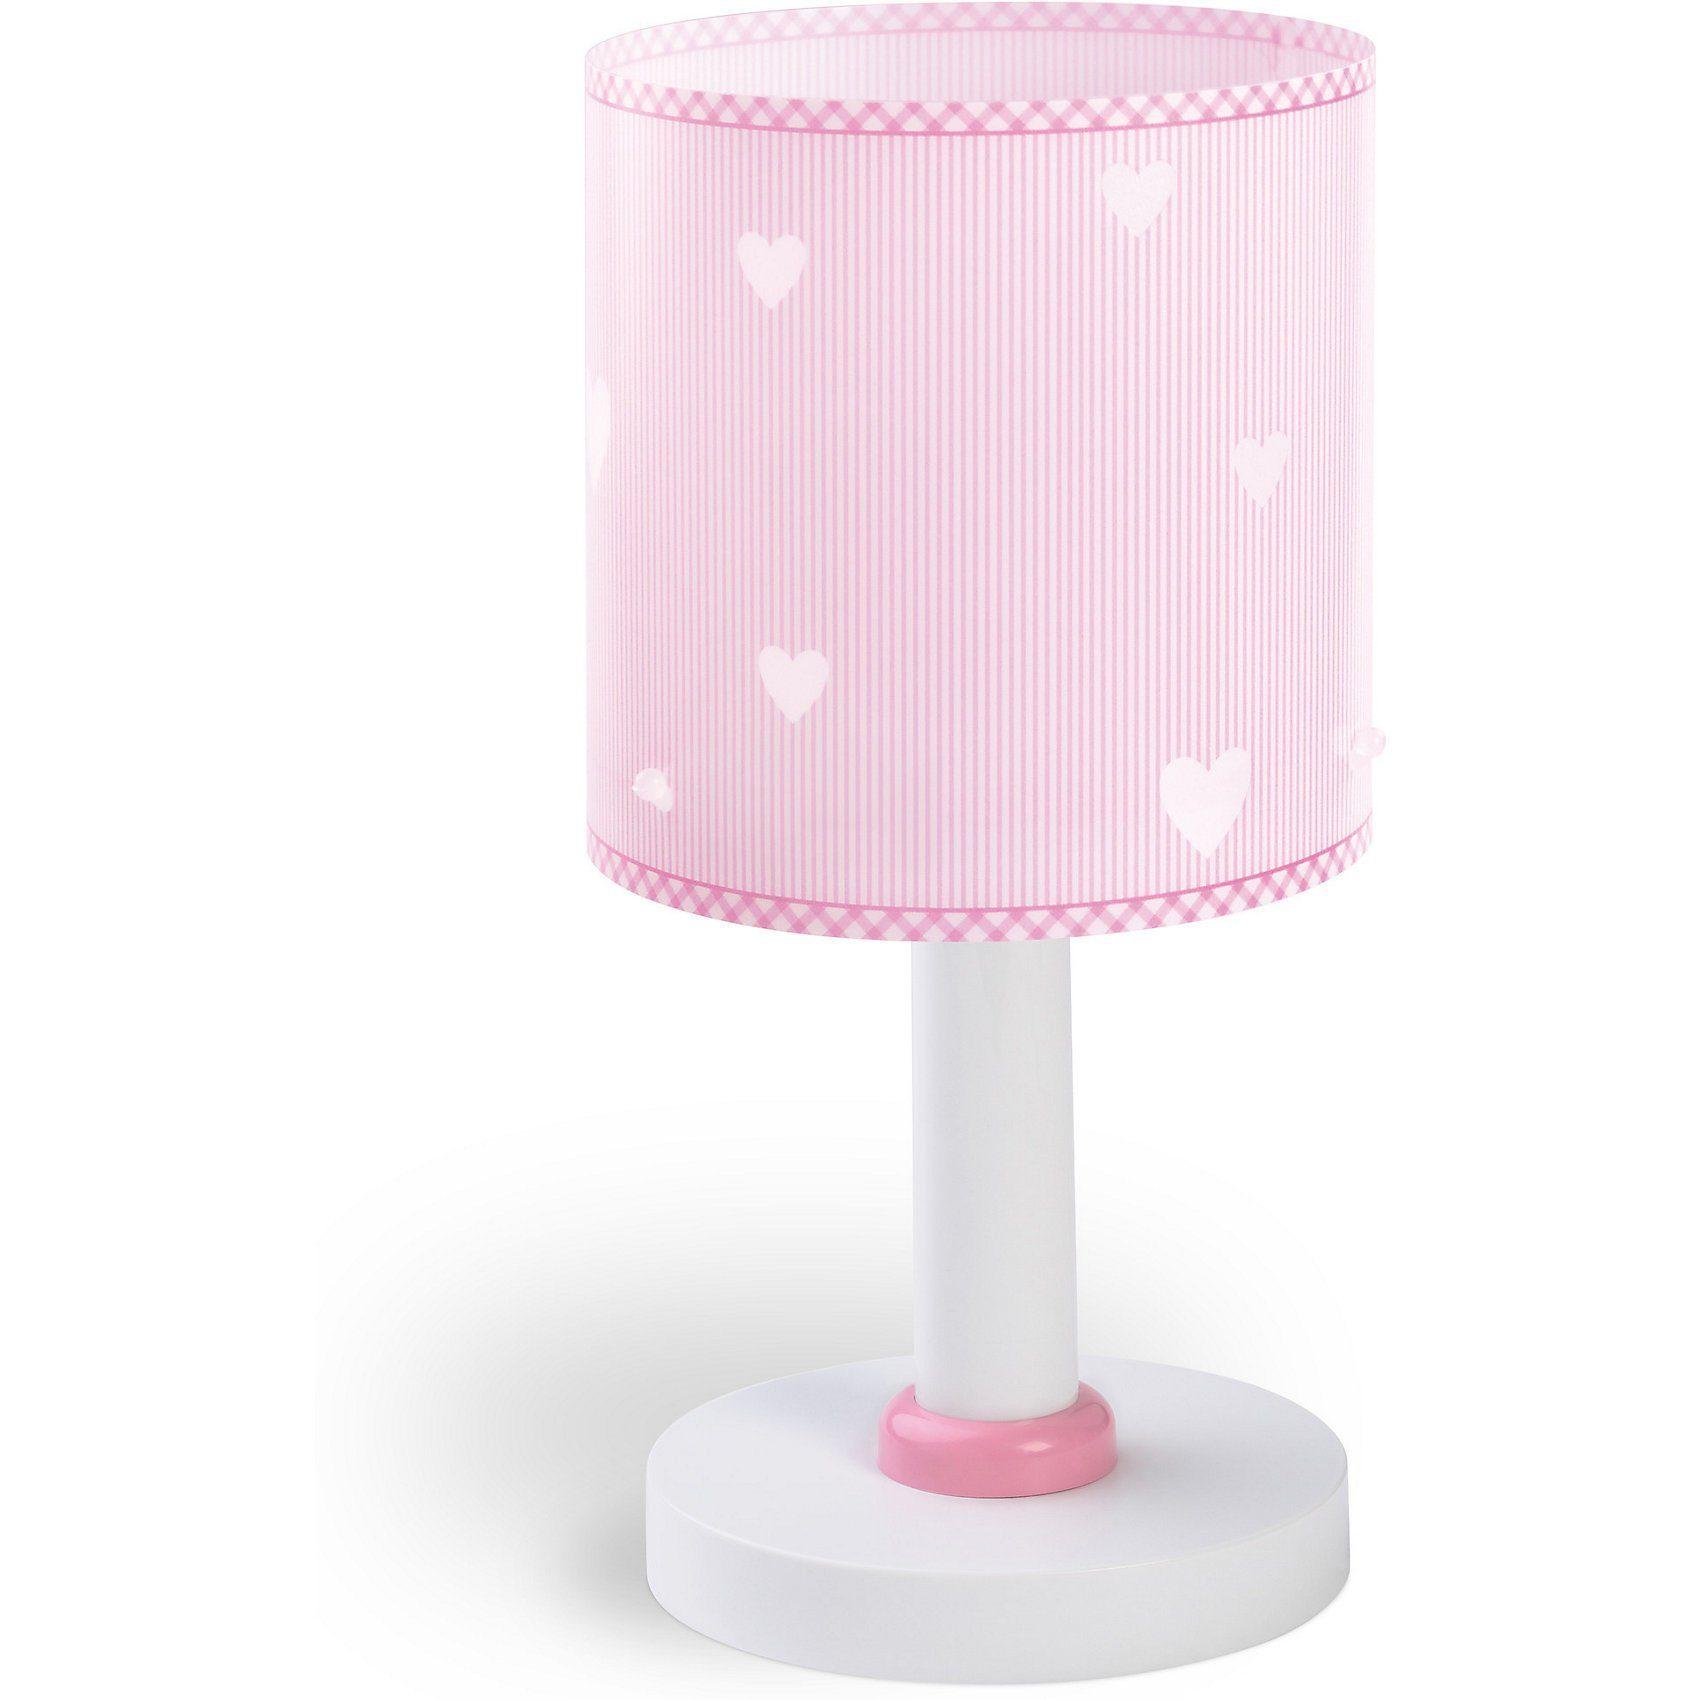 Dalber Tischlampe Sweet Dreams Herz, rosa